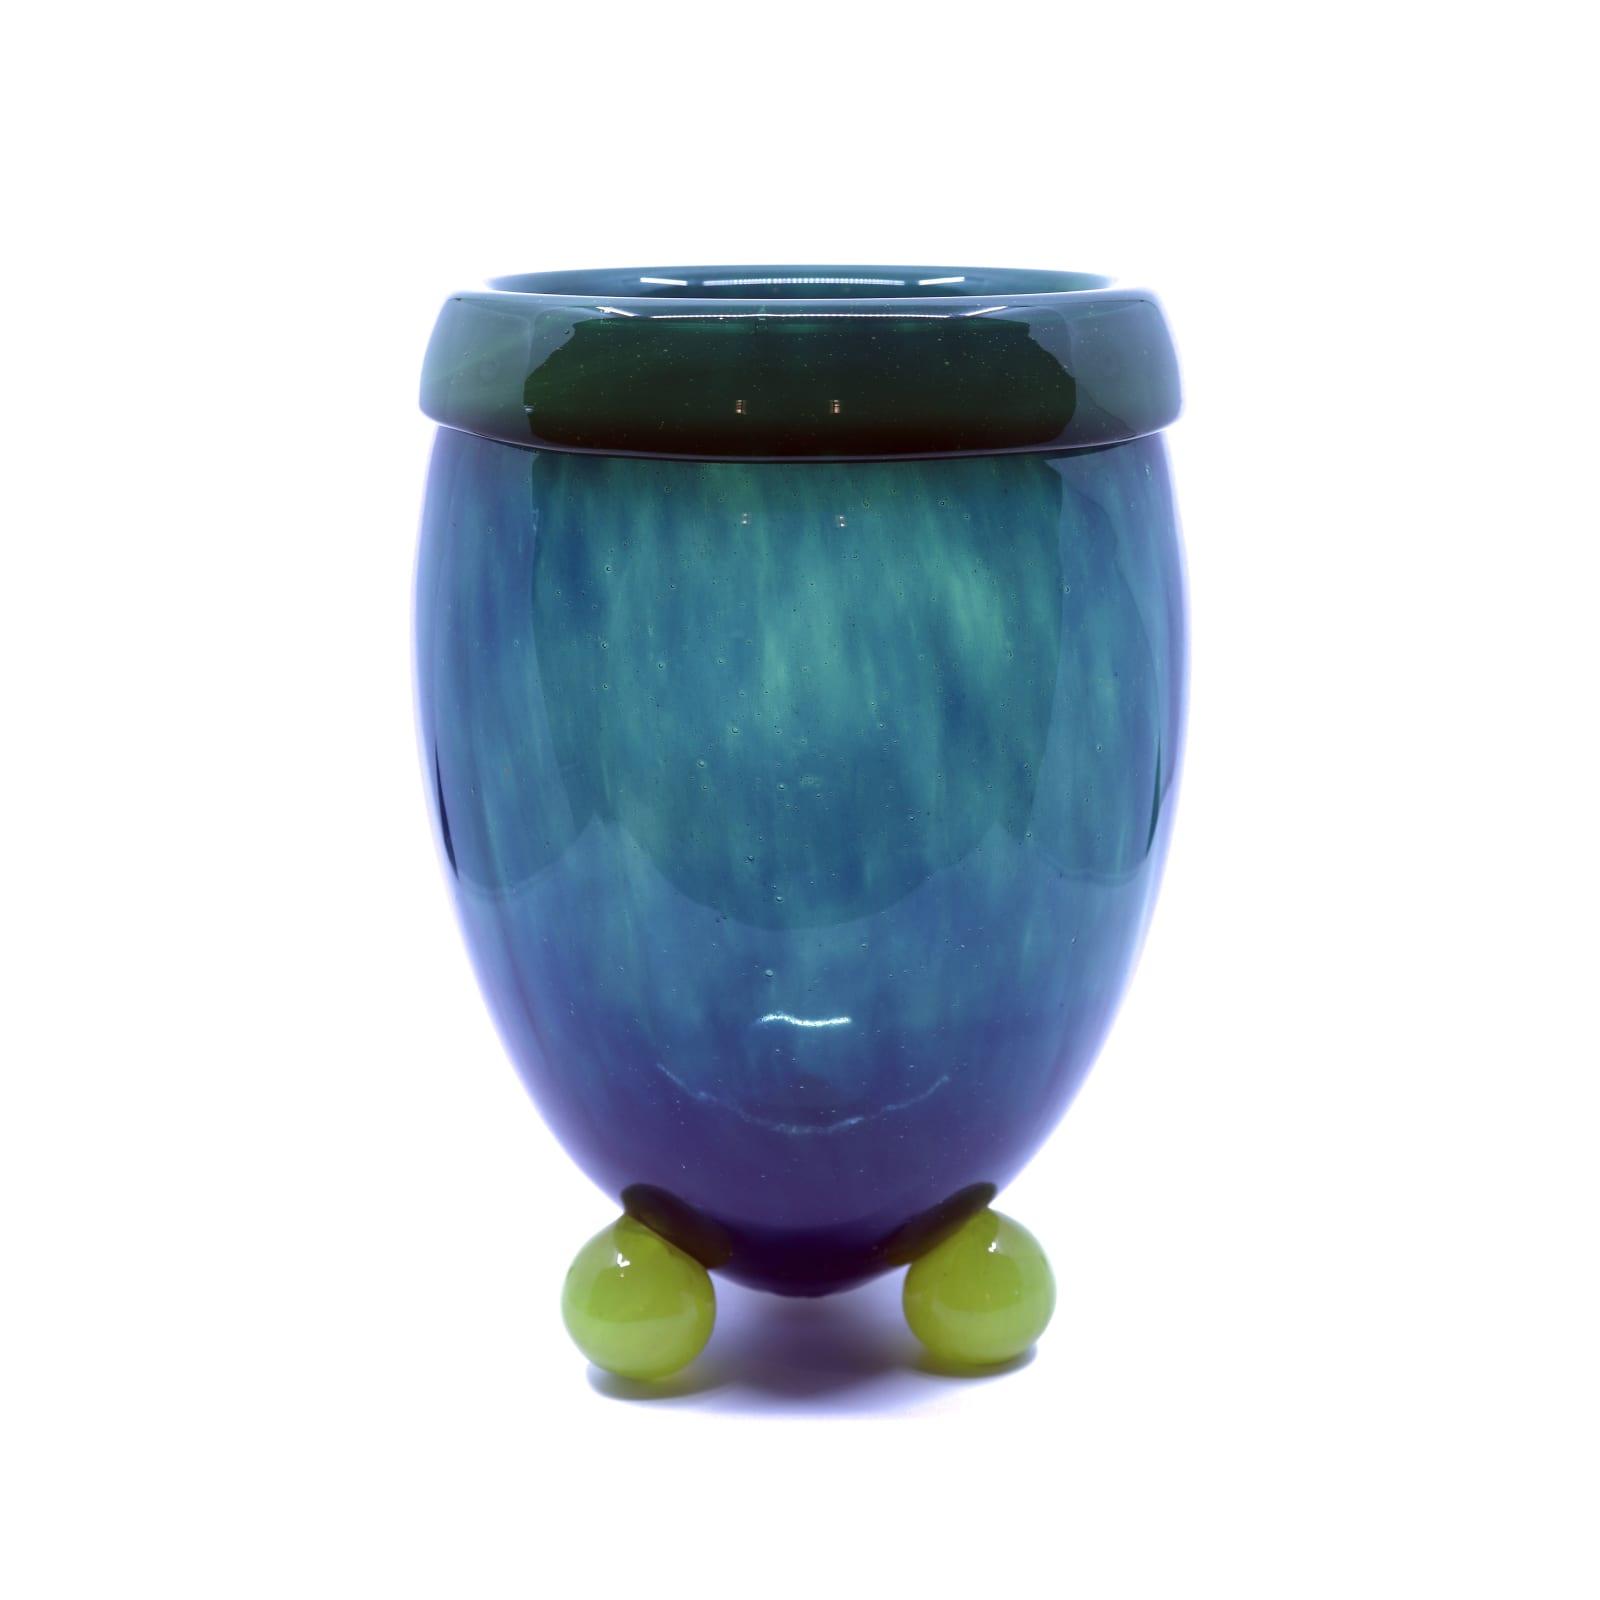 Charles Schneider Art Deco glass vase France, 1925